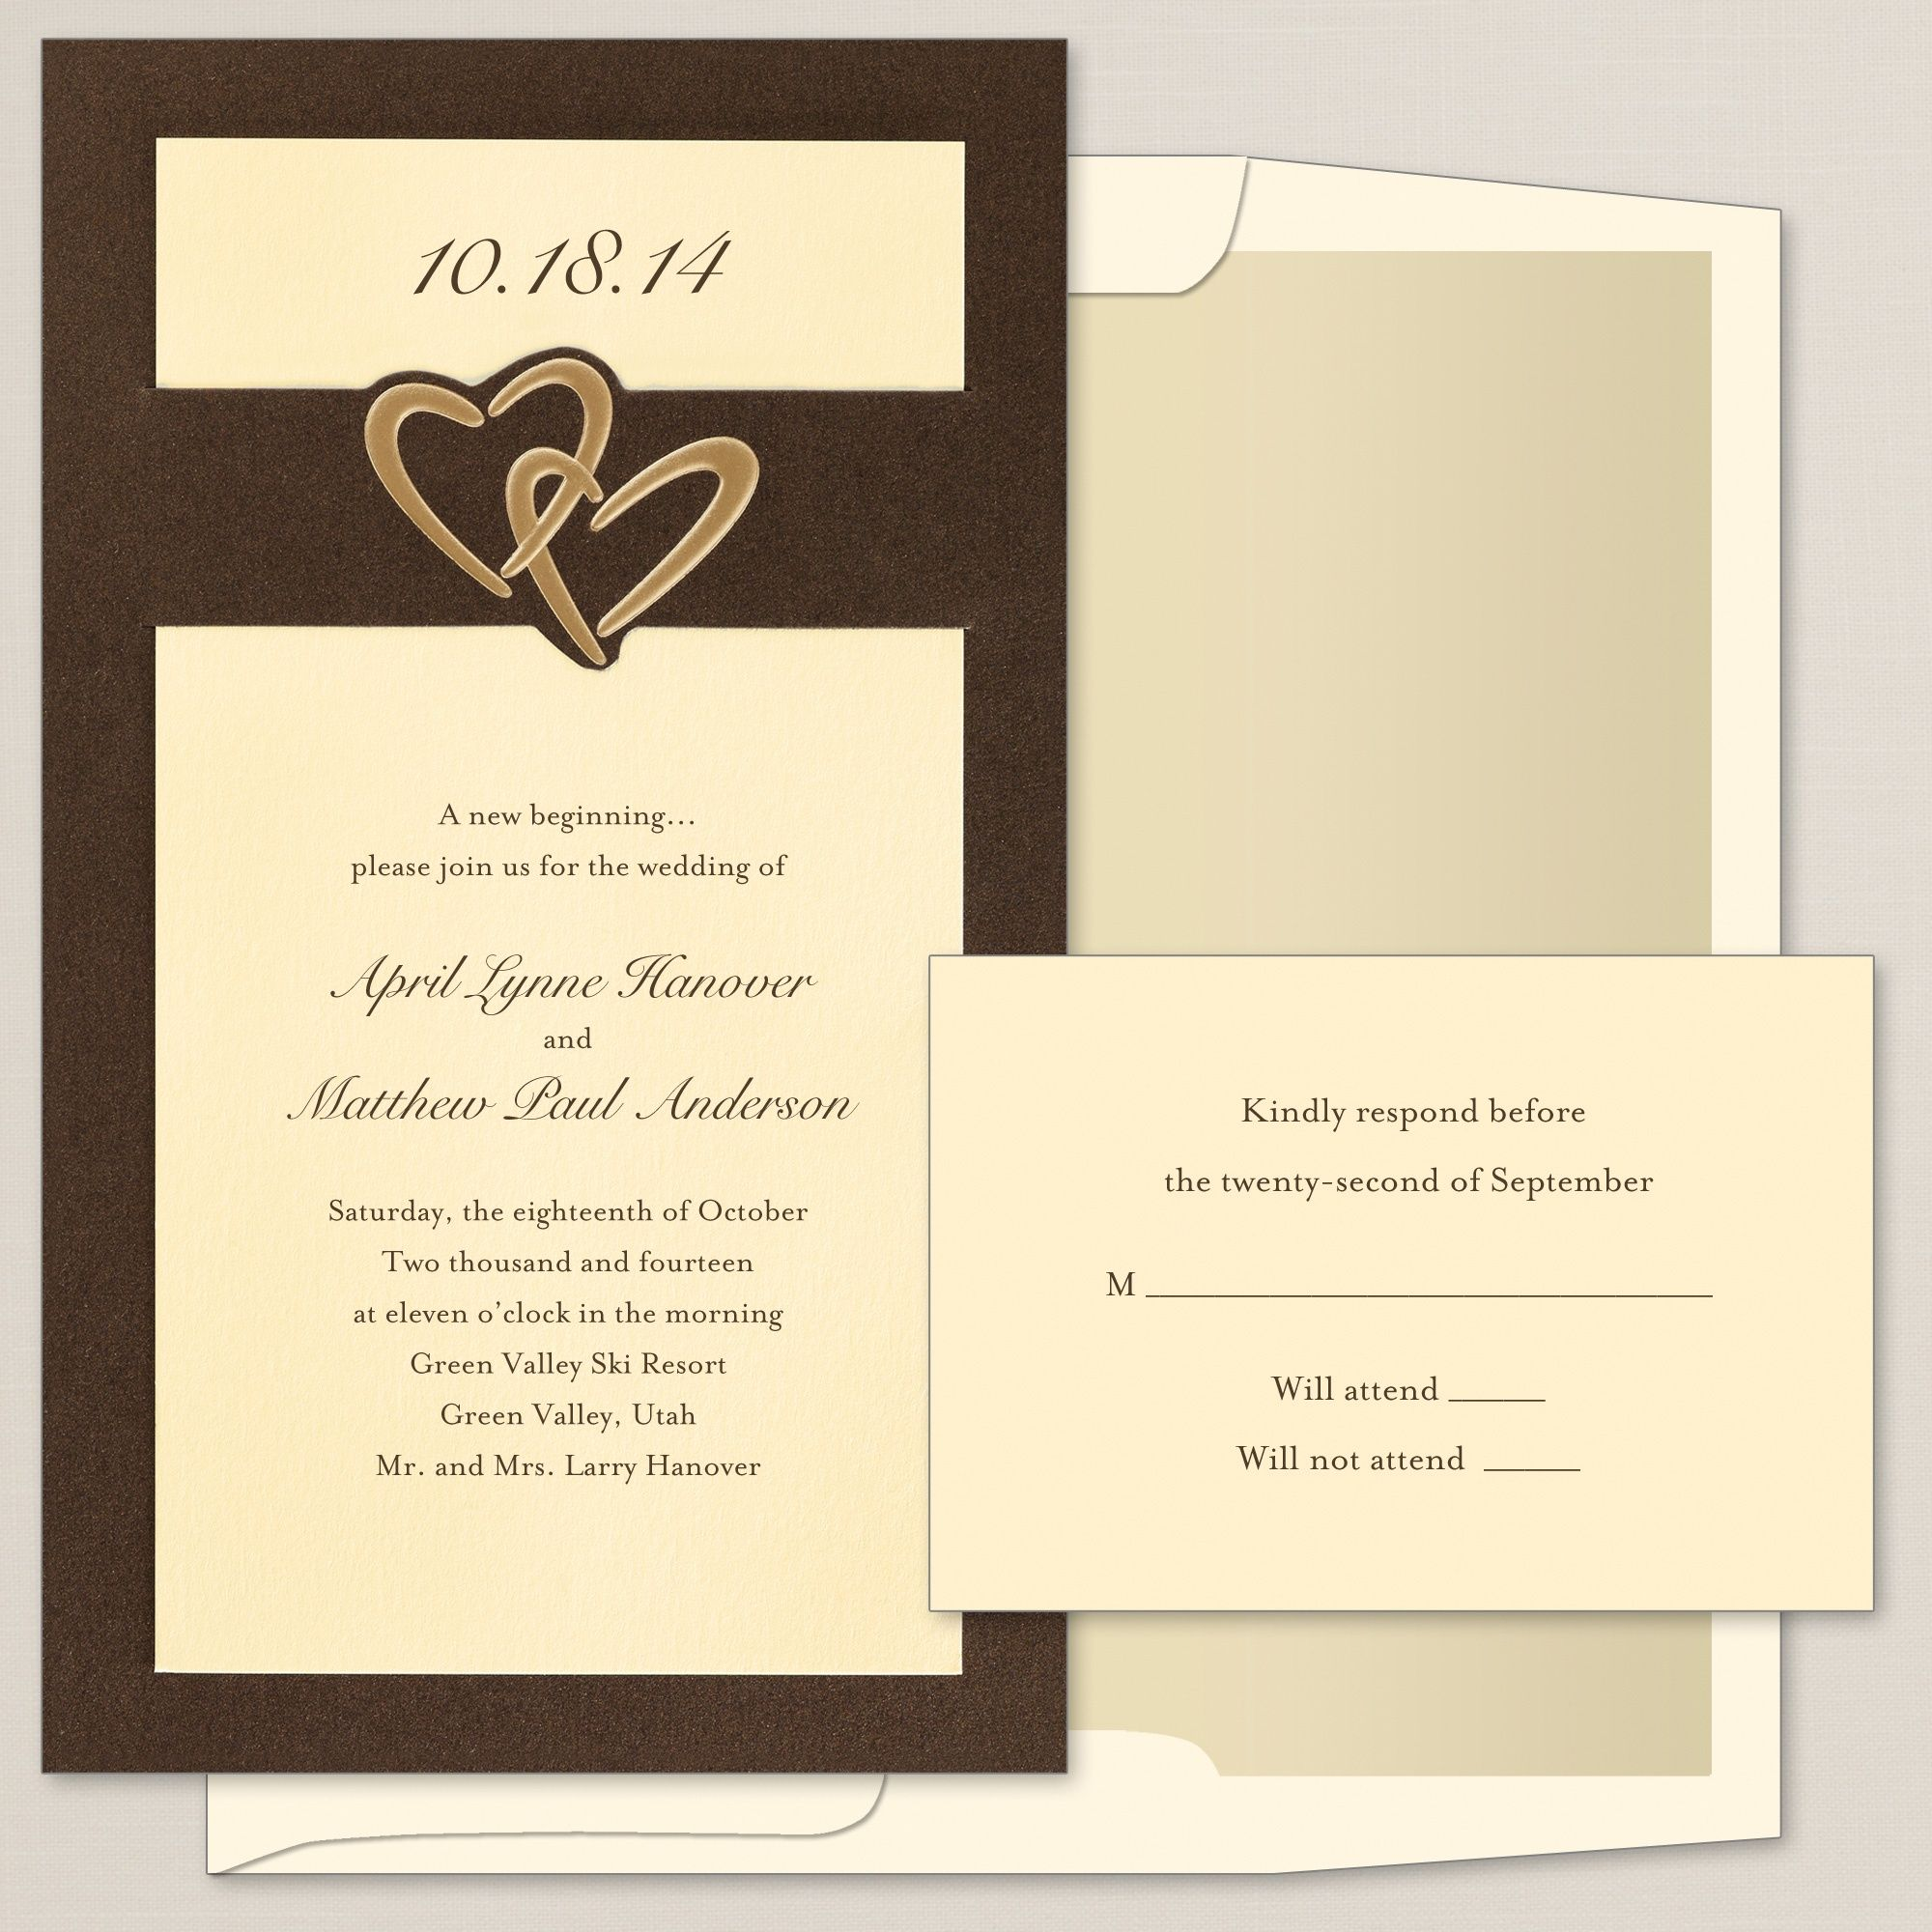 Heart duet wedding invitation exclusivelyweddings wedding stuff